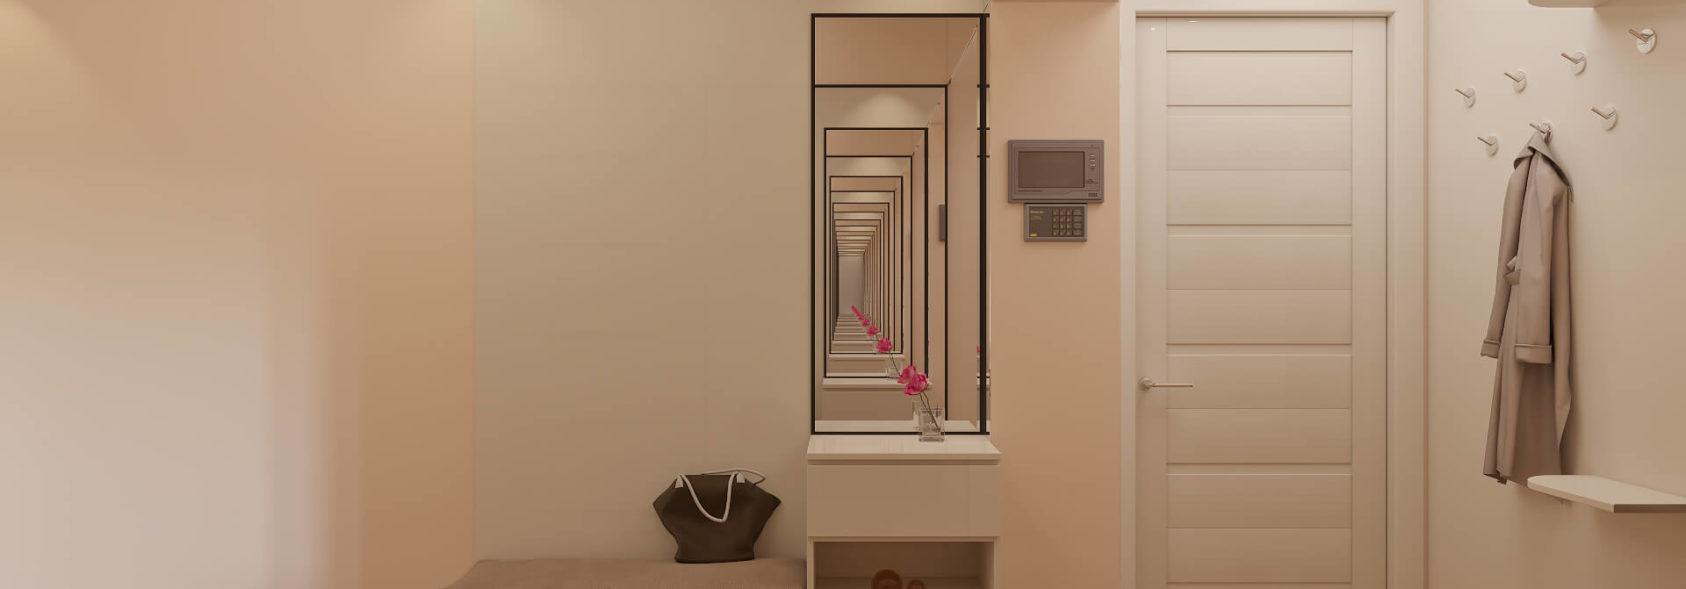 Дизайн 2х комнатной квартиры прихожая